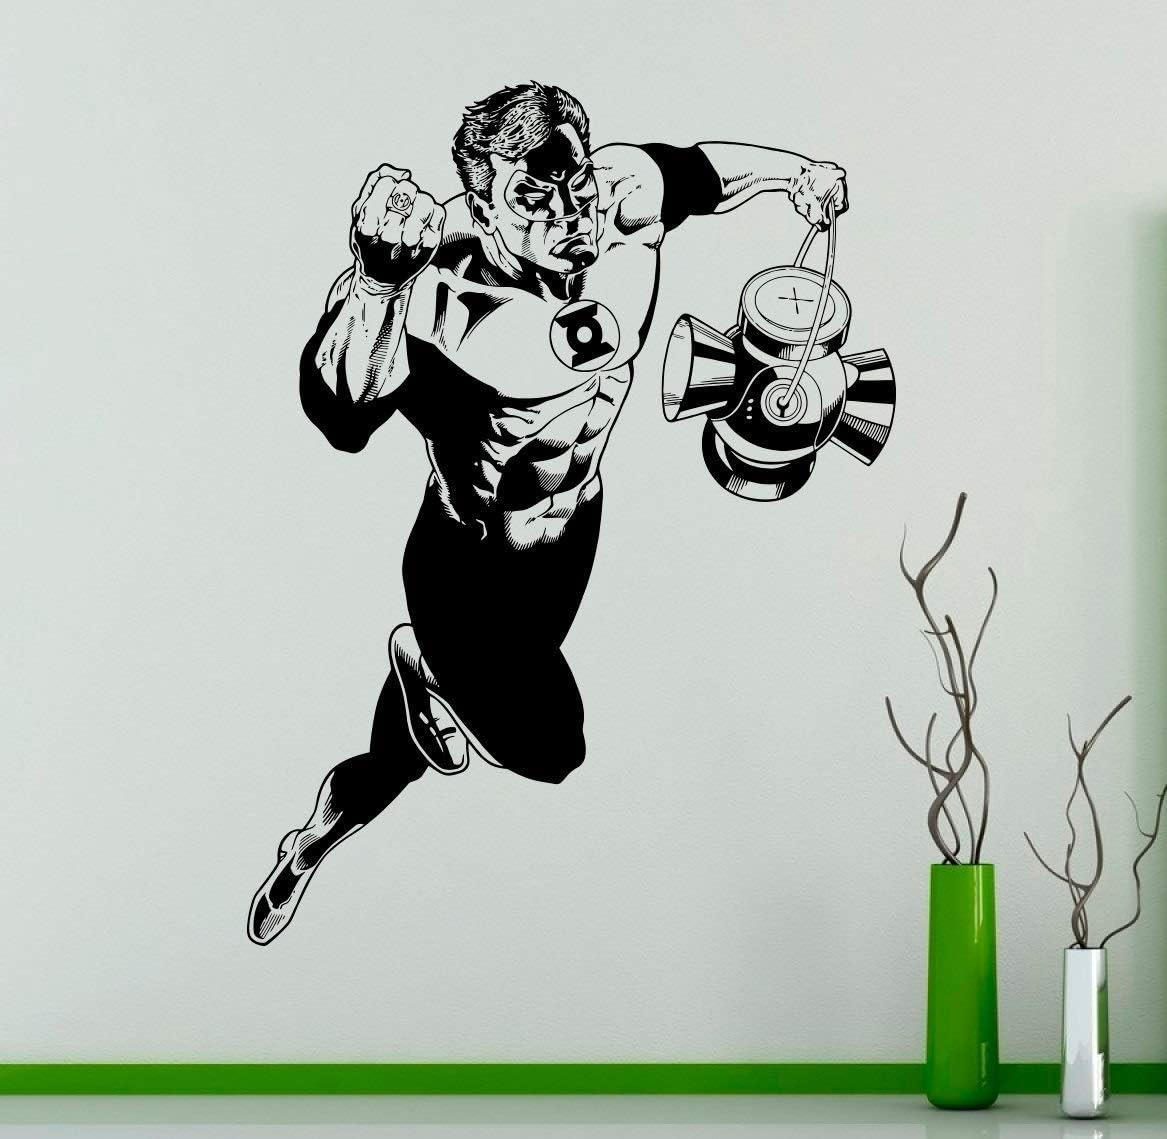 Place Green Lantern Superhero Wall Vinyl Decal Comics Wall Sticker Home Interior - Bedroom Decor Kids Room Wall Design Made in USA - 22x35 Inch